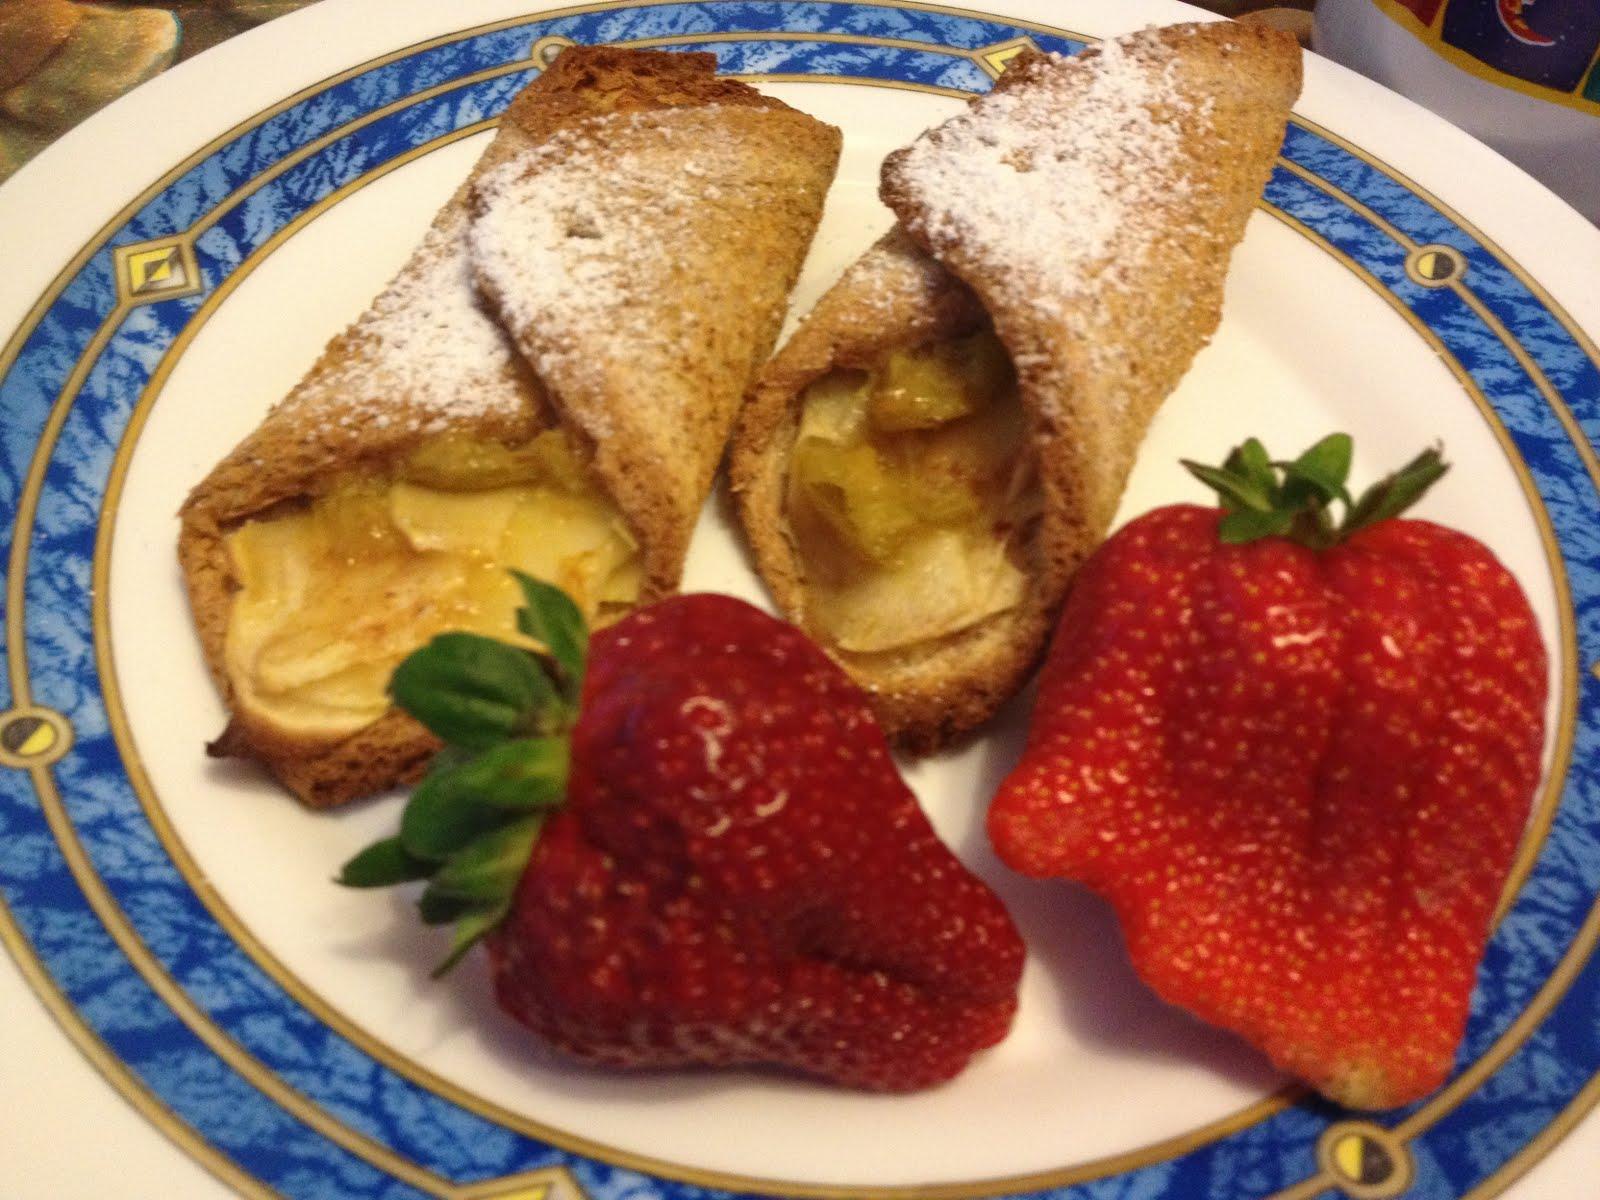 ¡Con esta receta empecé mi blog!